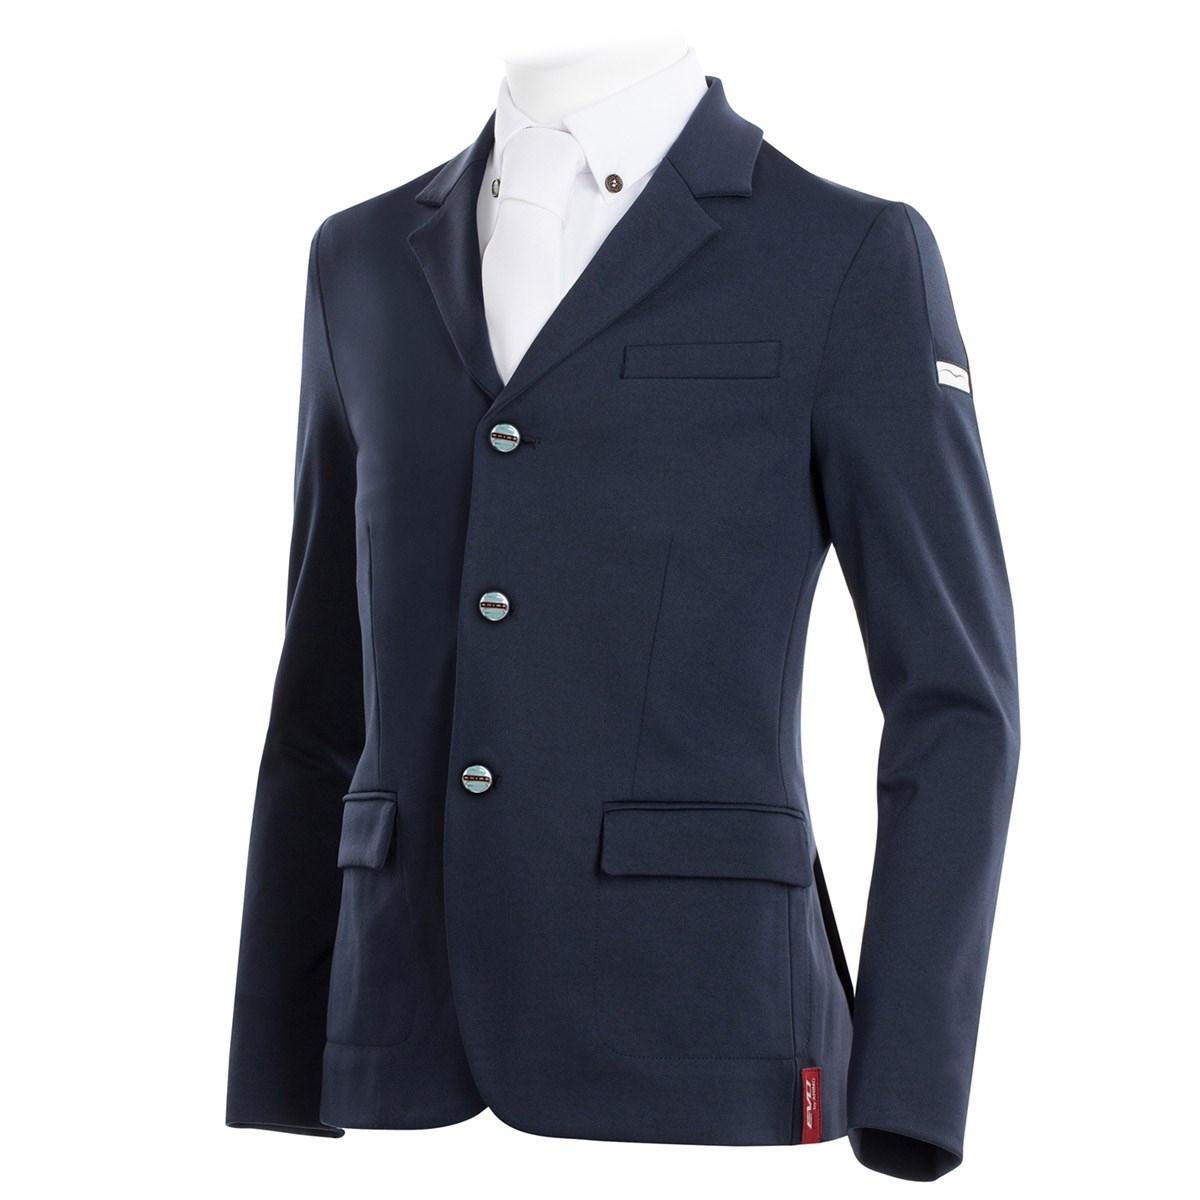 Animo Iachin Boys Competition Jacket